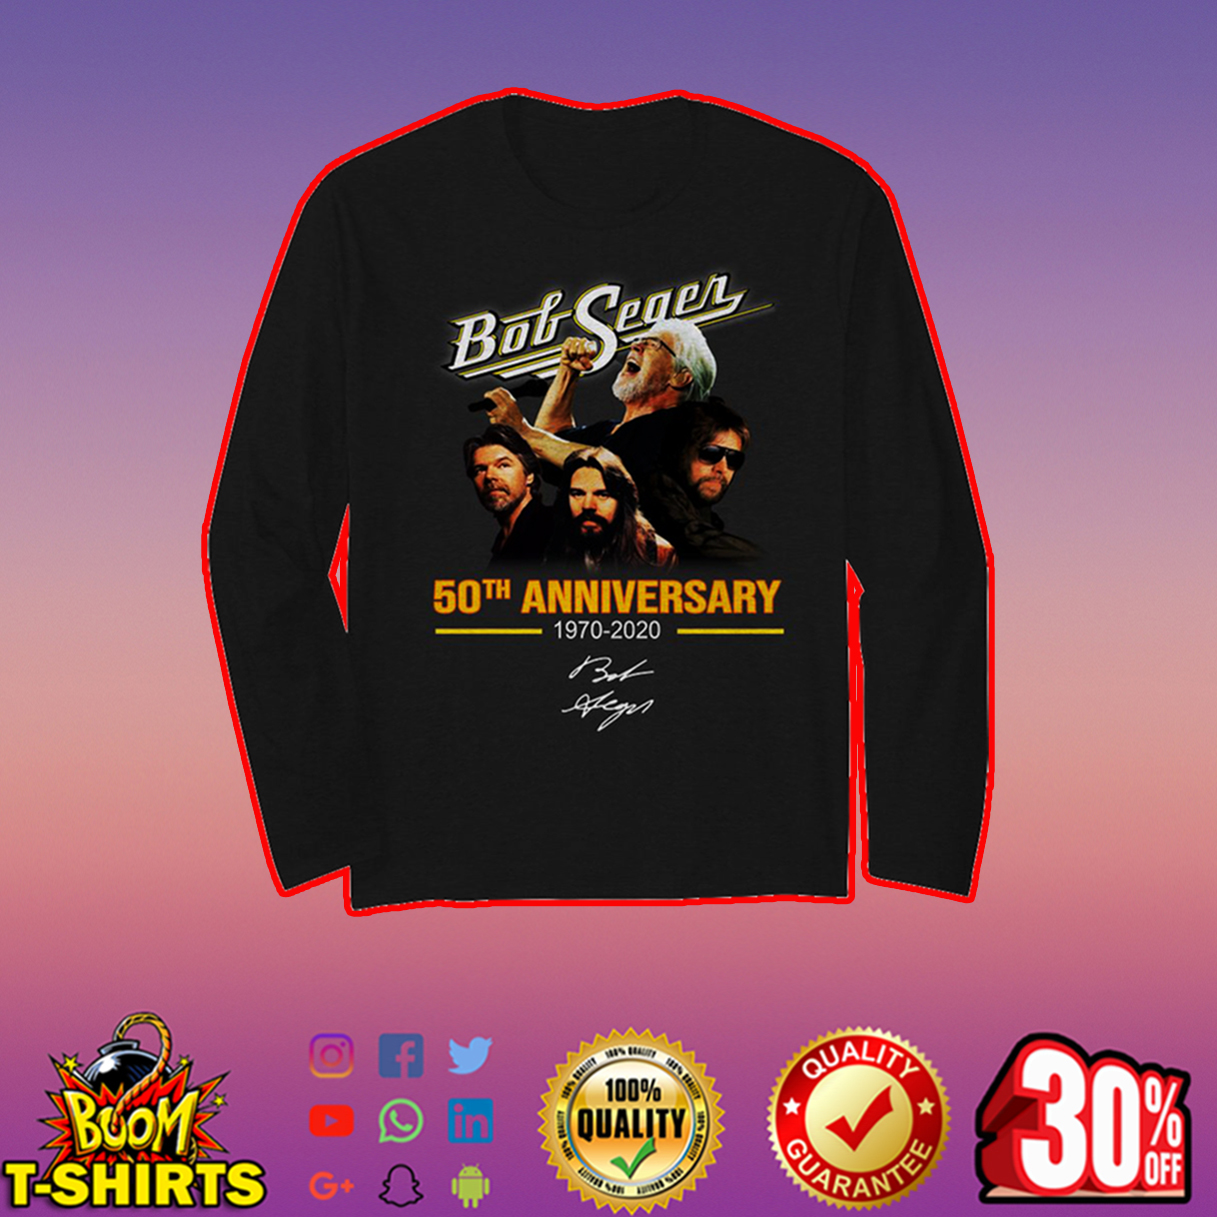 Bob Seger 50th anniversary signature long sleeve t-shirt